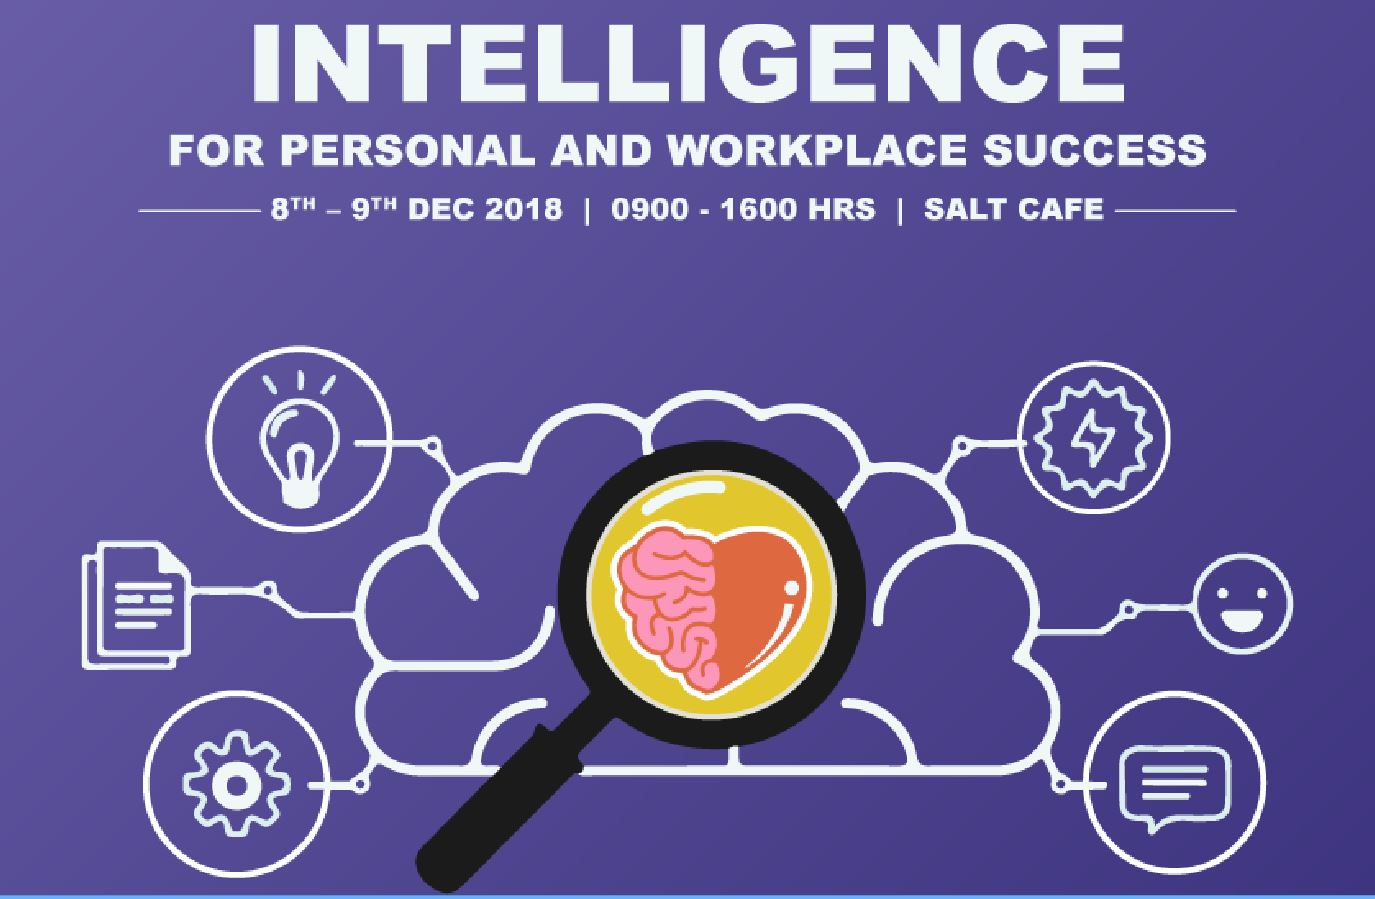 Intranet Maldives To Host Workshop On Emotional Intelligence Diagram News